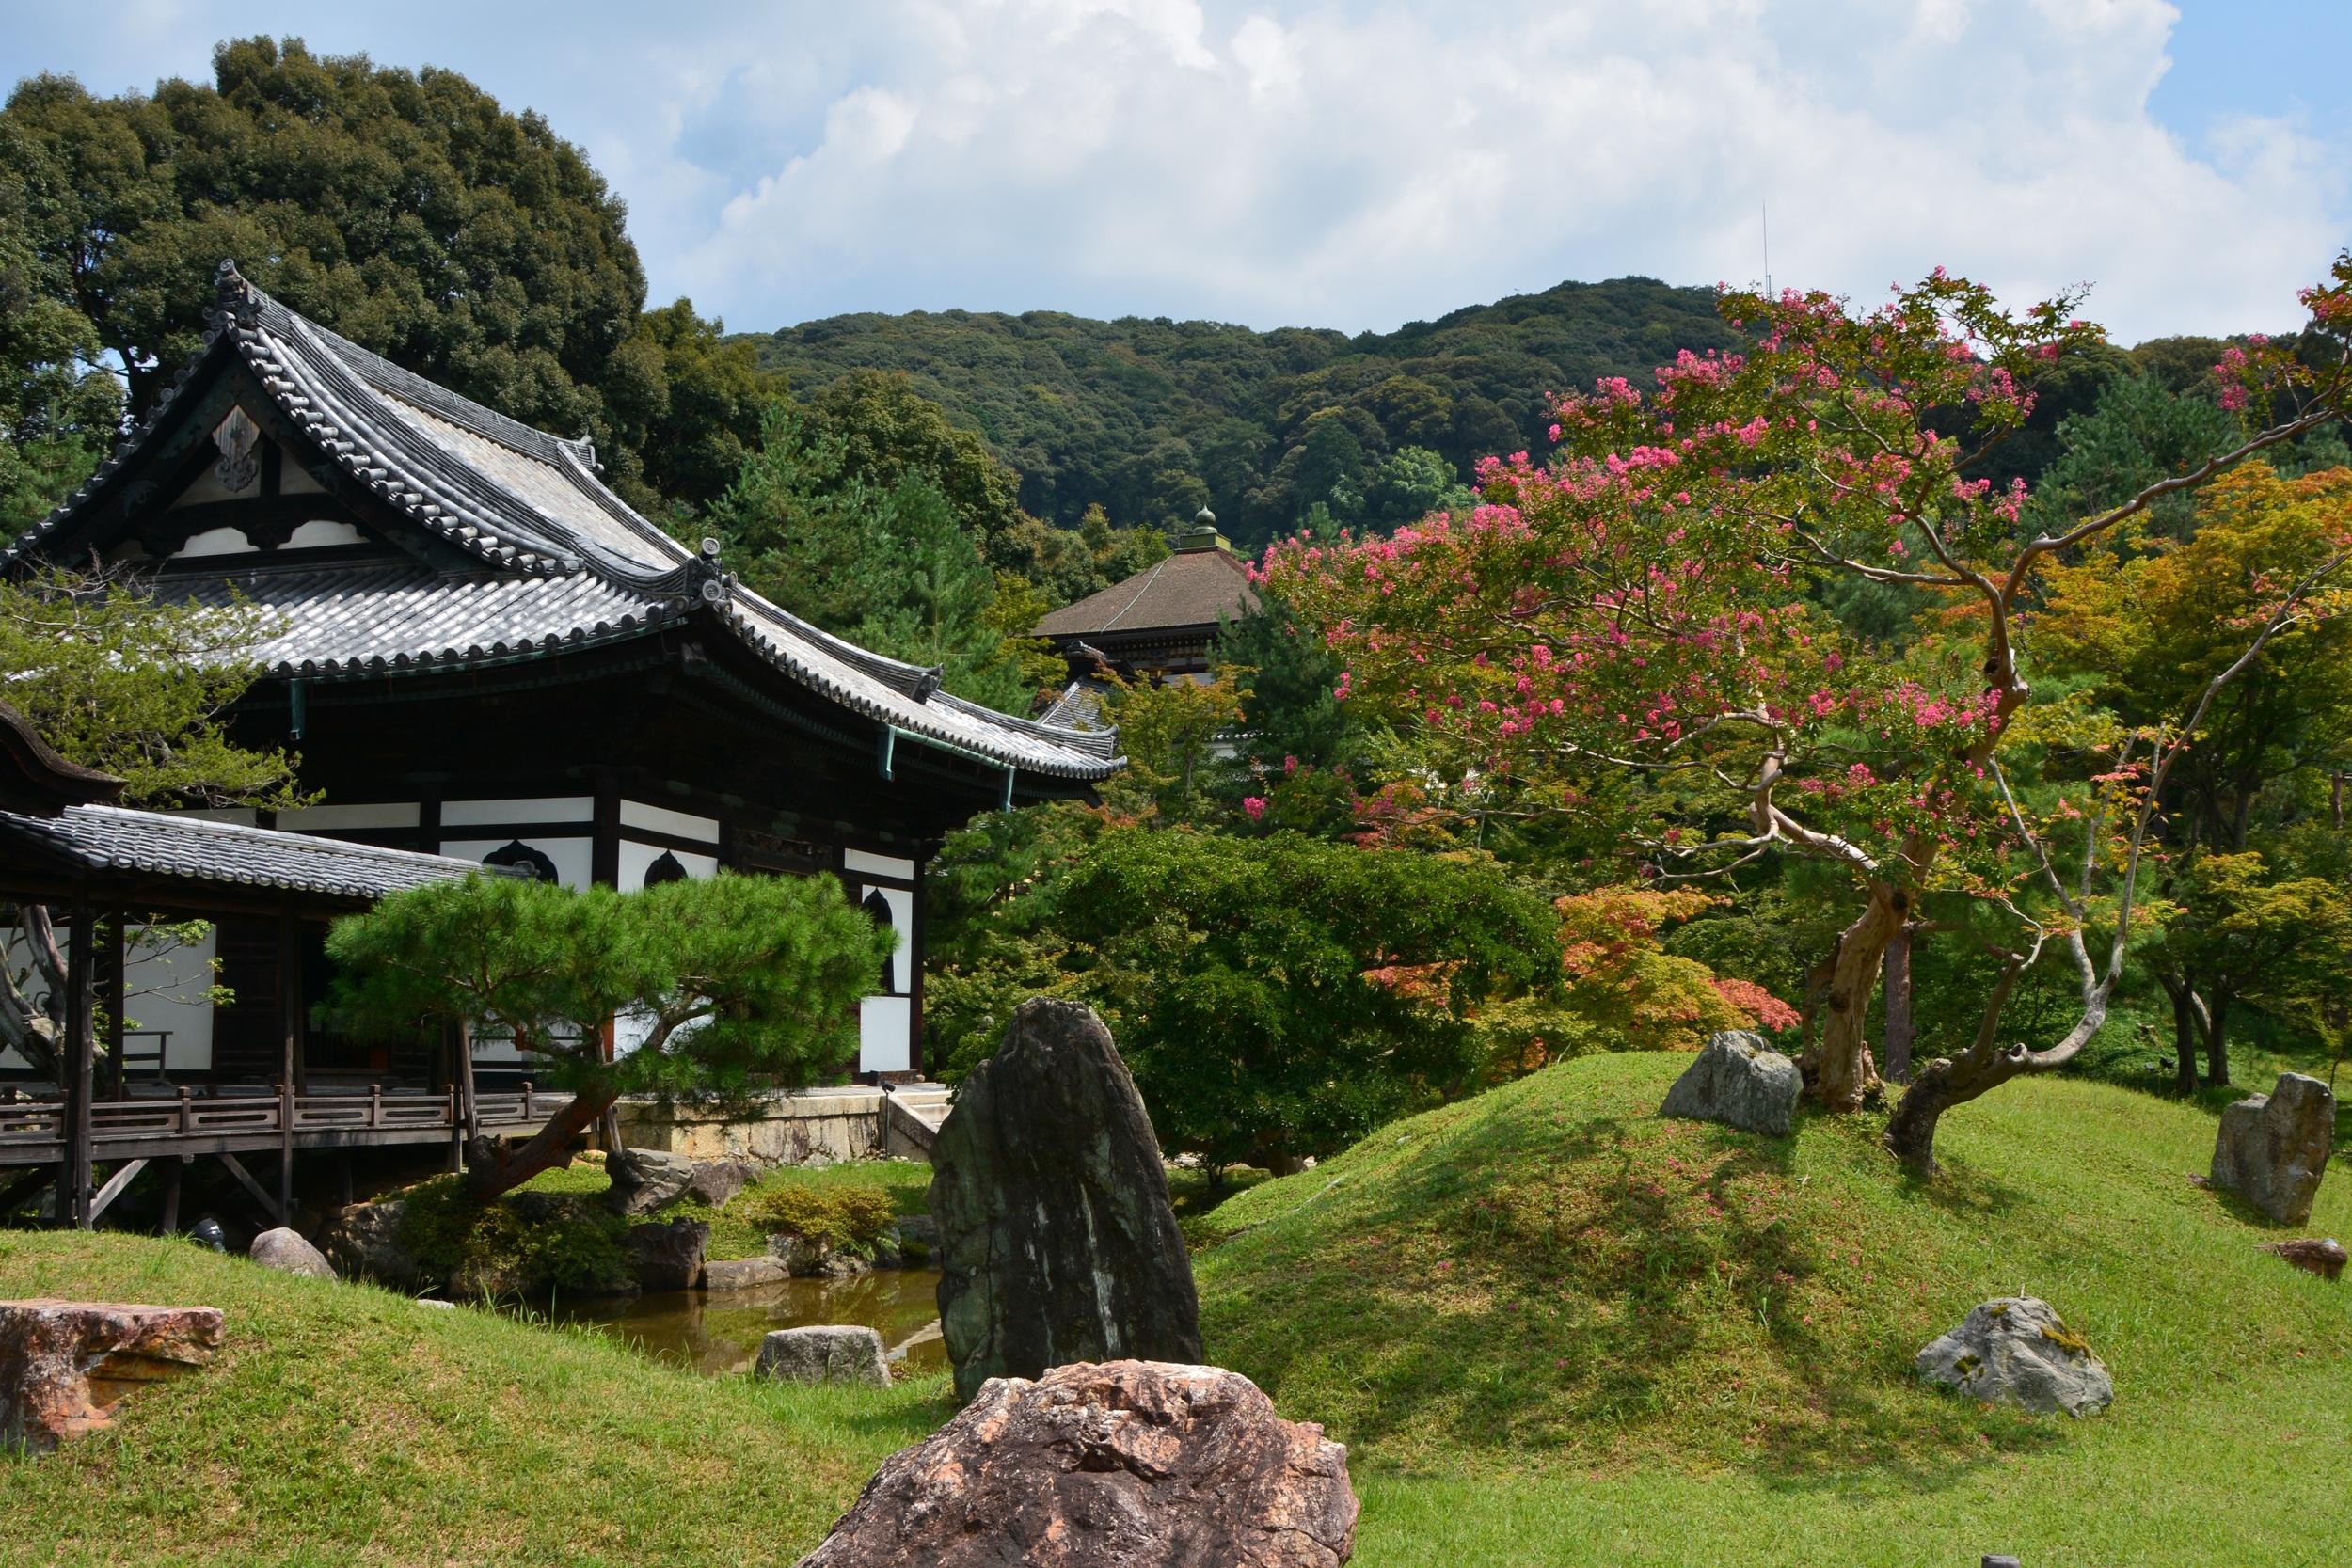 Koda-ji Temple and Gardens